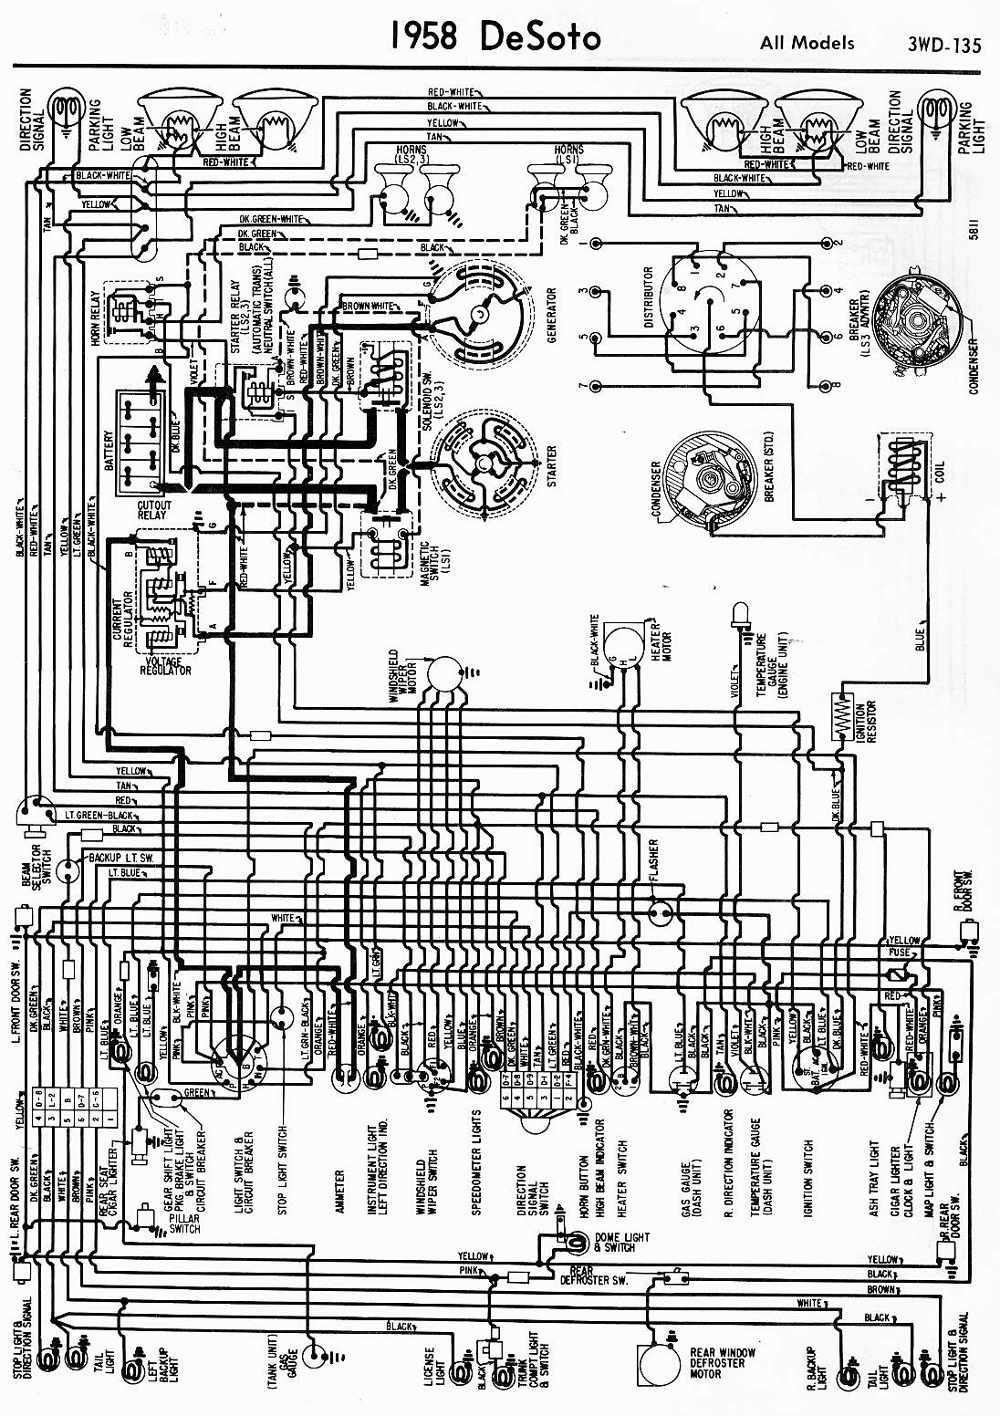 small resolution of 1960 desoto wiring diagram enthusiast wiring diagrams u2022 rh rasalibre co 1960 chrysler 1960 dodge